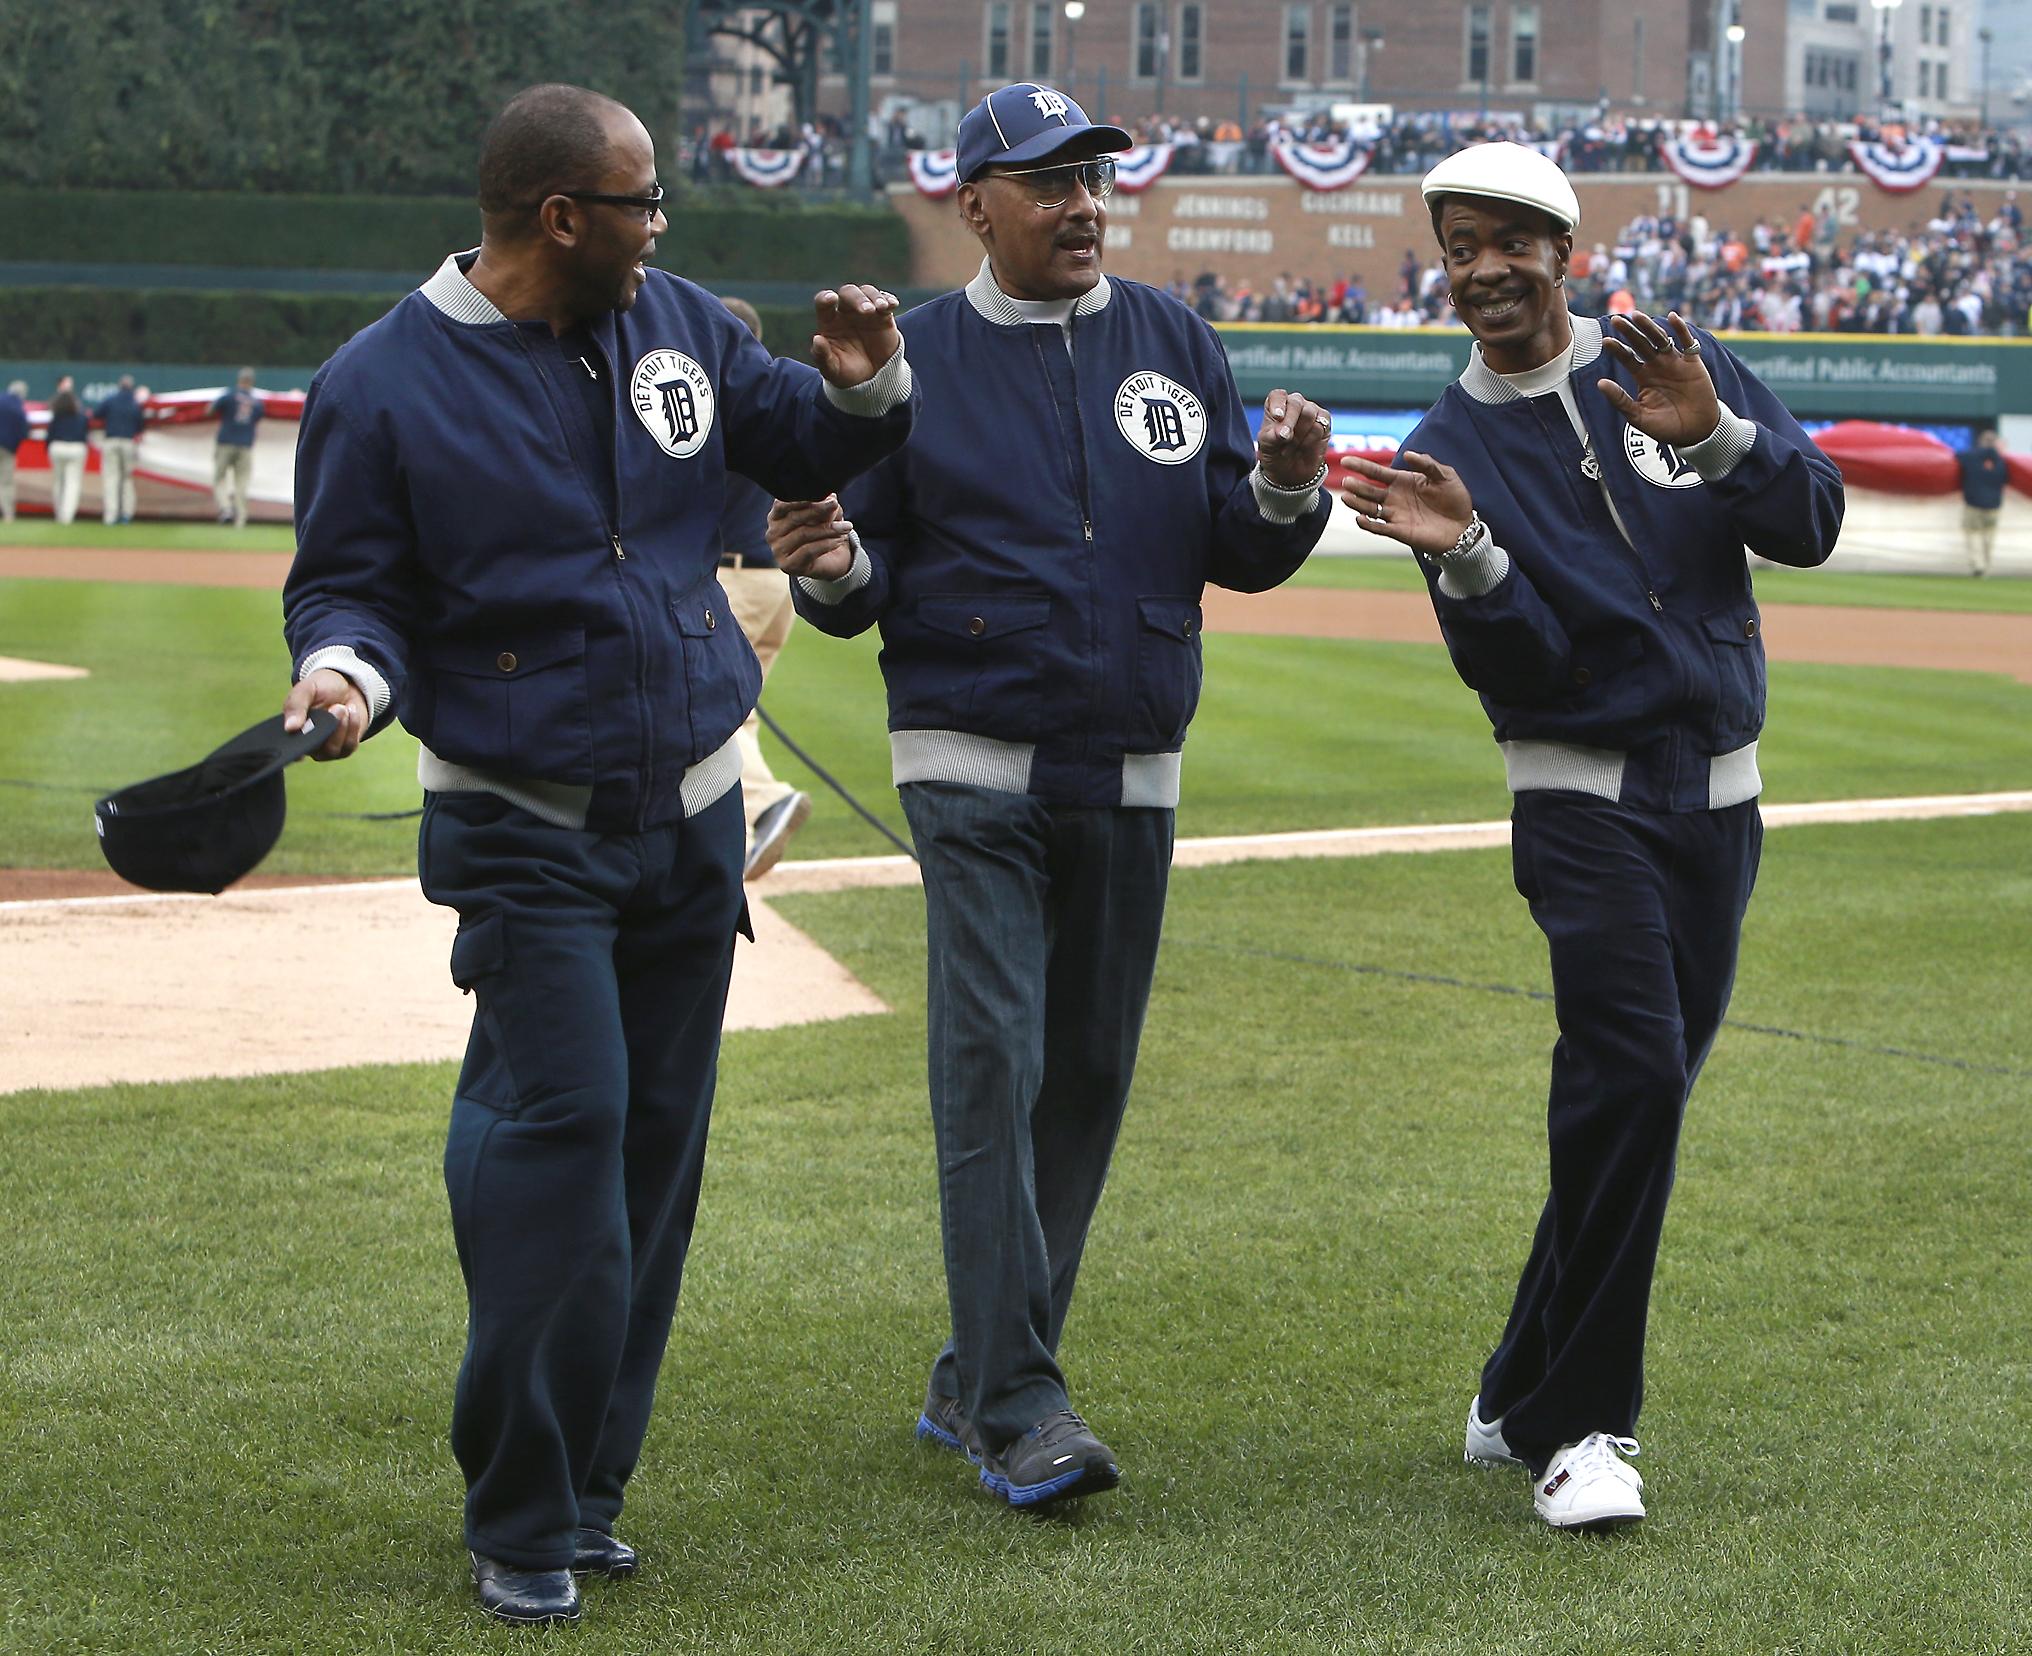 ALCS Game 3: Boston Red Sox Vs. Detroit Tigers At Comerica Park